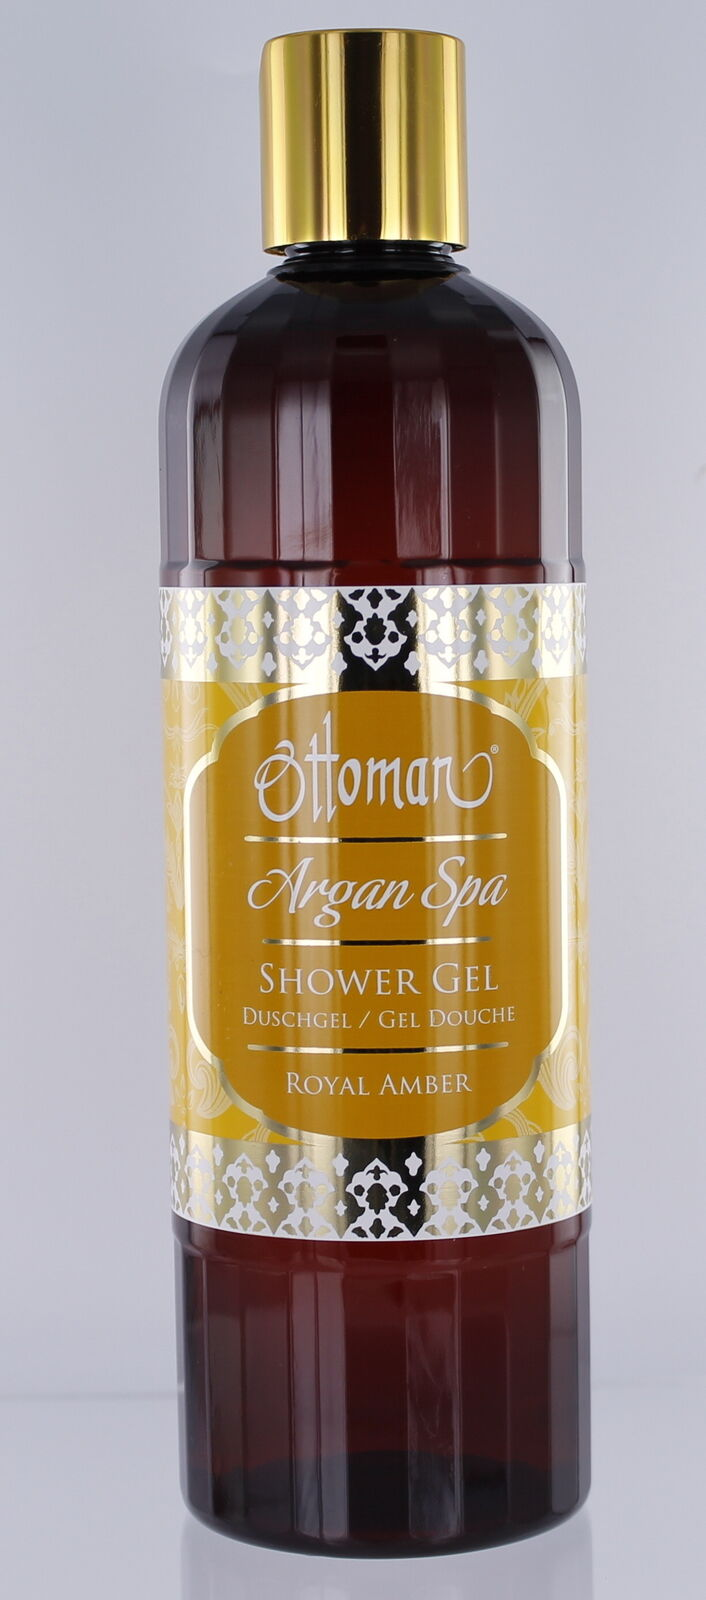 Duschgel Royal Amber 400 ml ph neutral alle Hauttypen Kräuter Ottoman Argan Spa